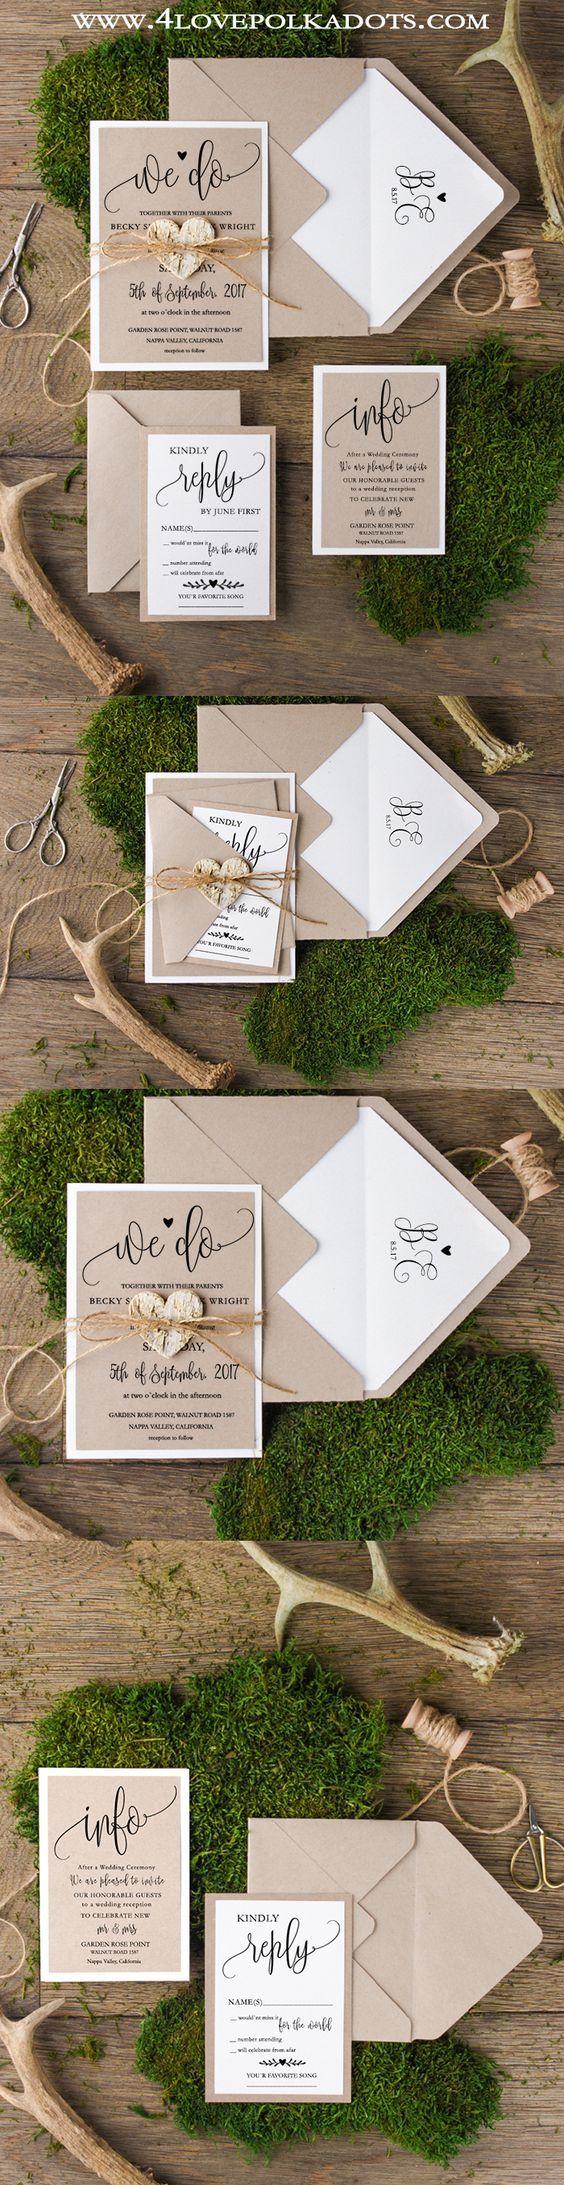 Rustic Wedding Invitations || @4lovepolkadots | Jurina Ayars Wedding ...